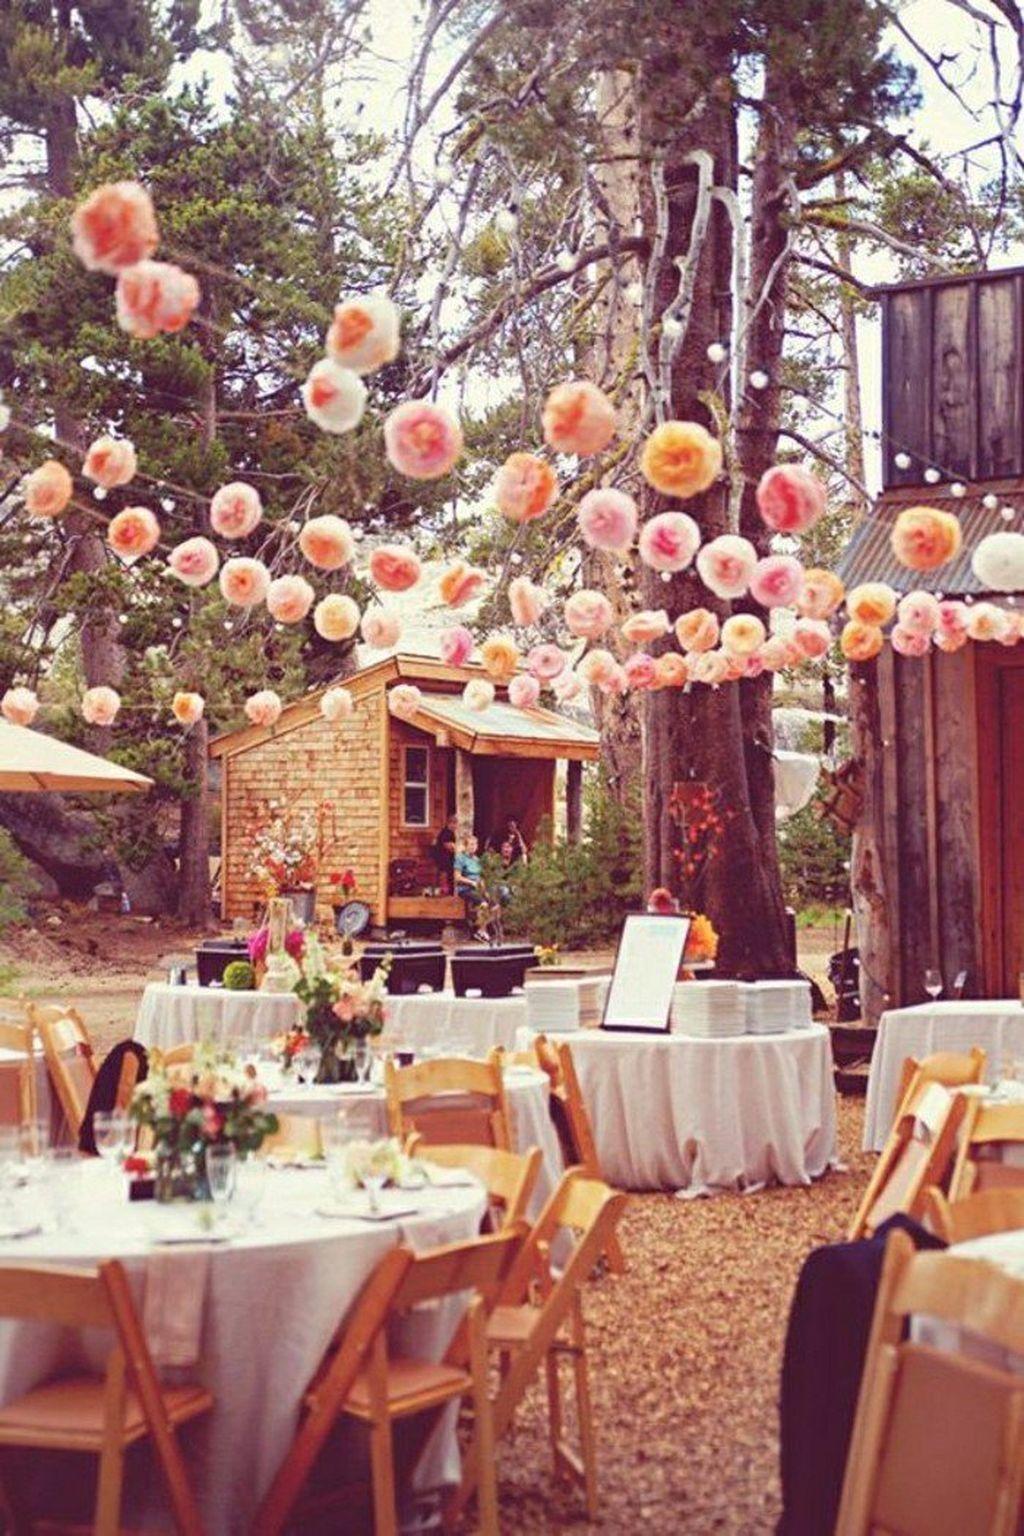 86 elegant rustic wedding decoration ideas 2017 decoration 86 elegant rustic wedding decoration ideas 2017 junglespirit Image collections